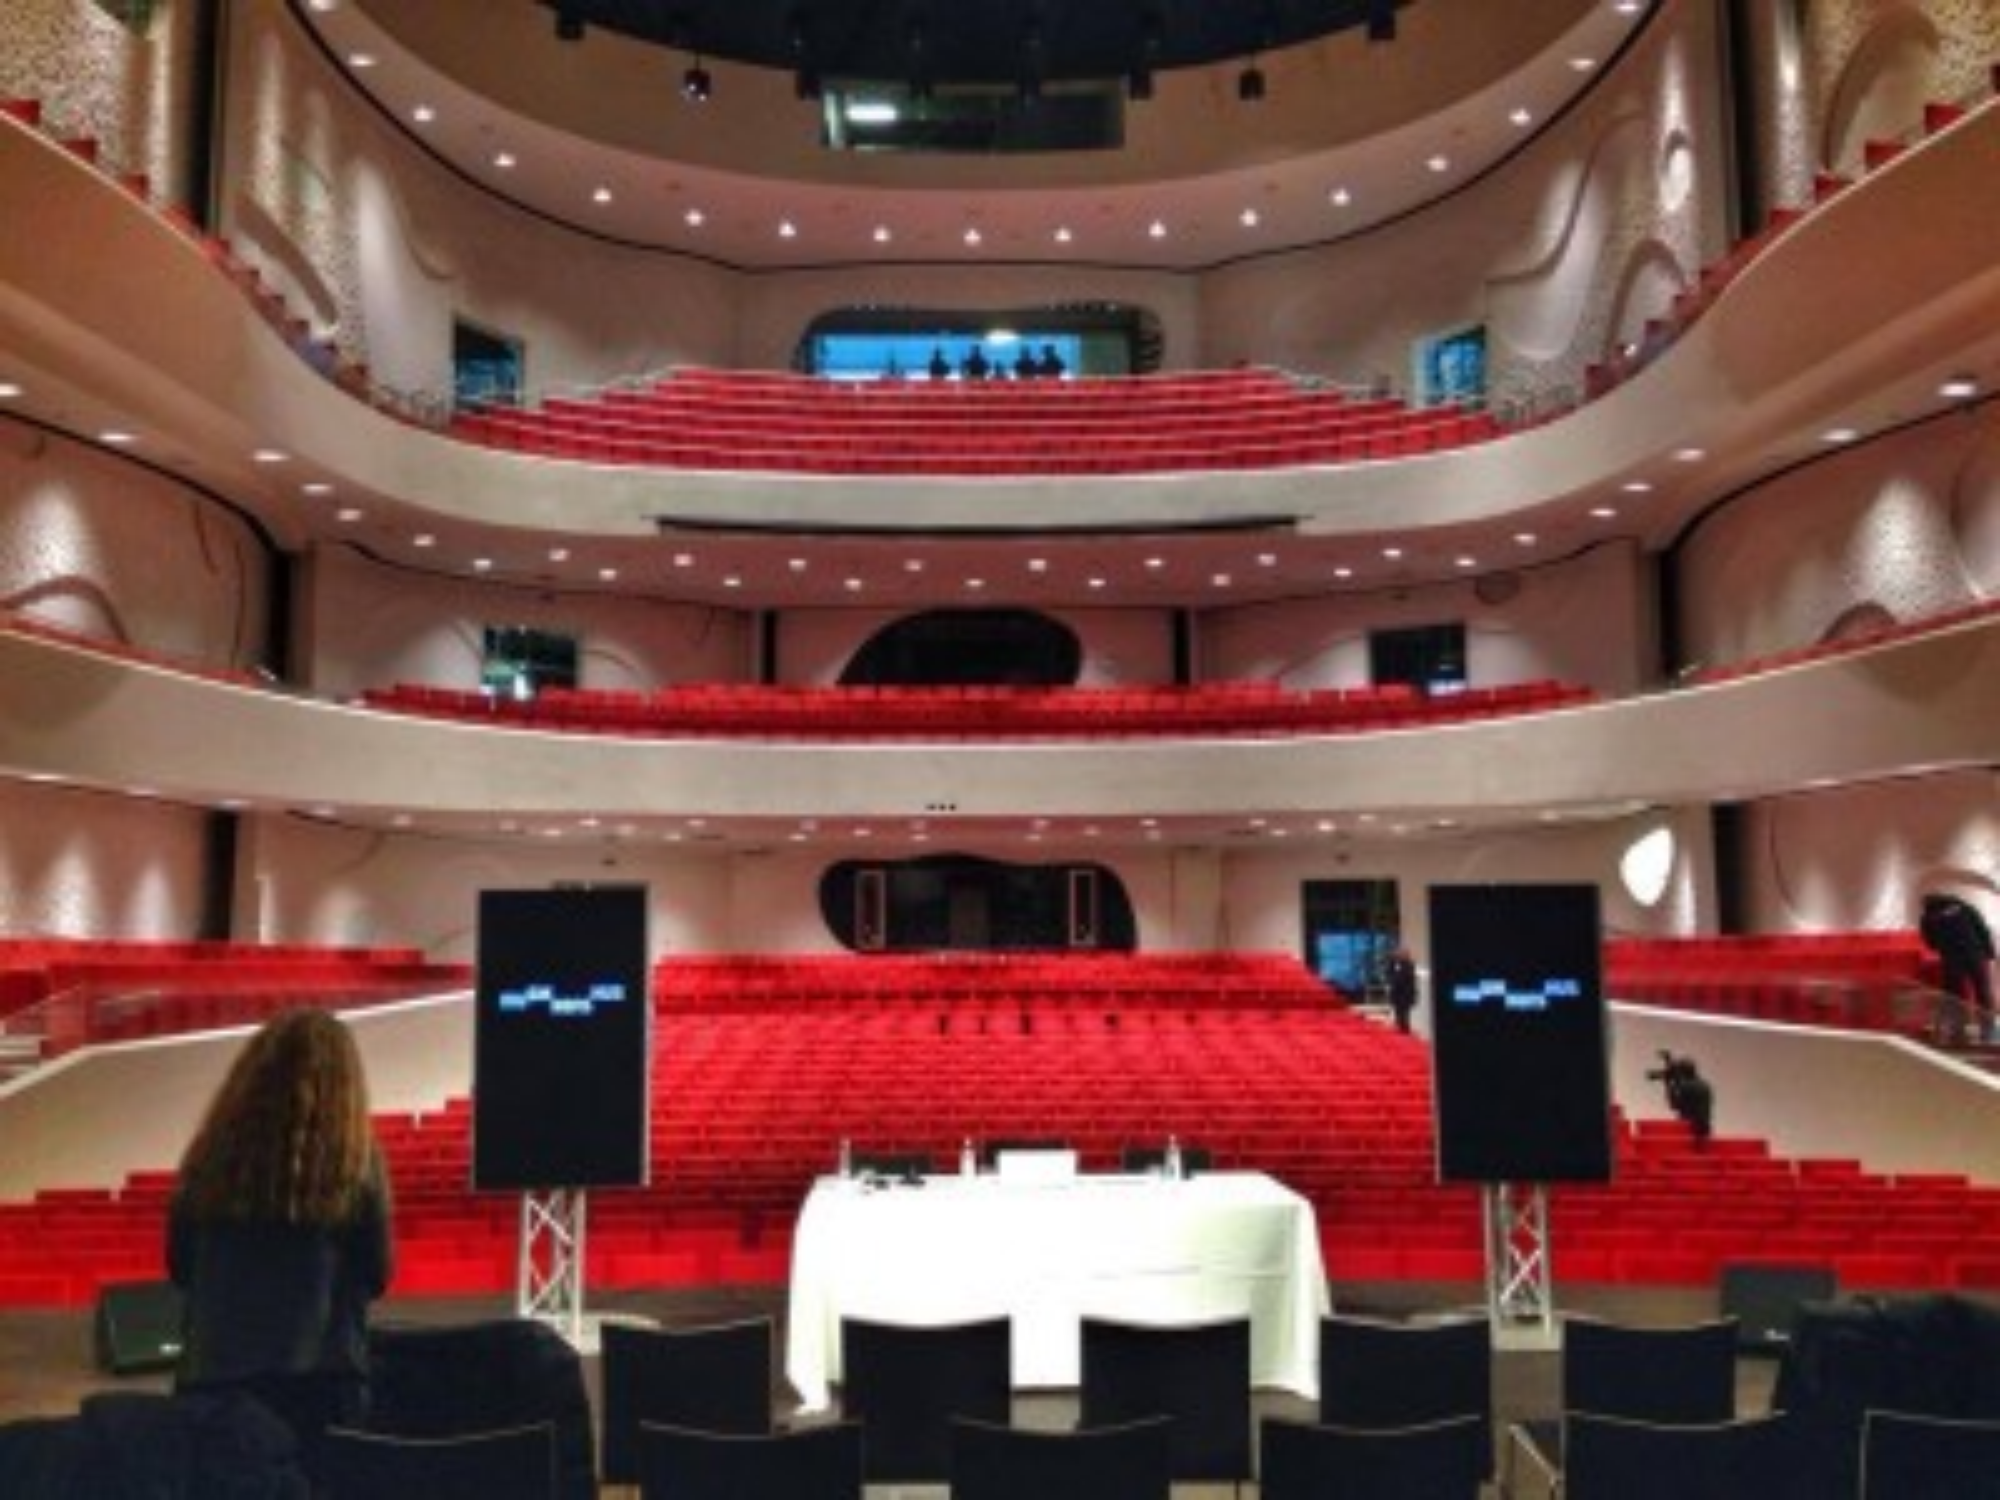 aalborg biografer Dr koncertsal